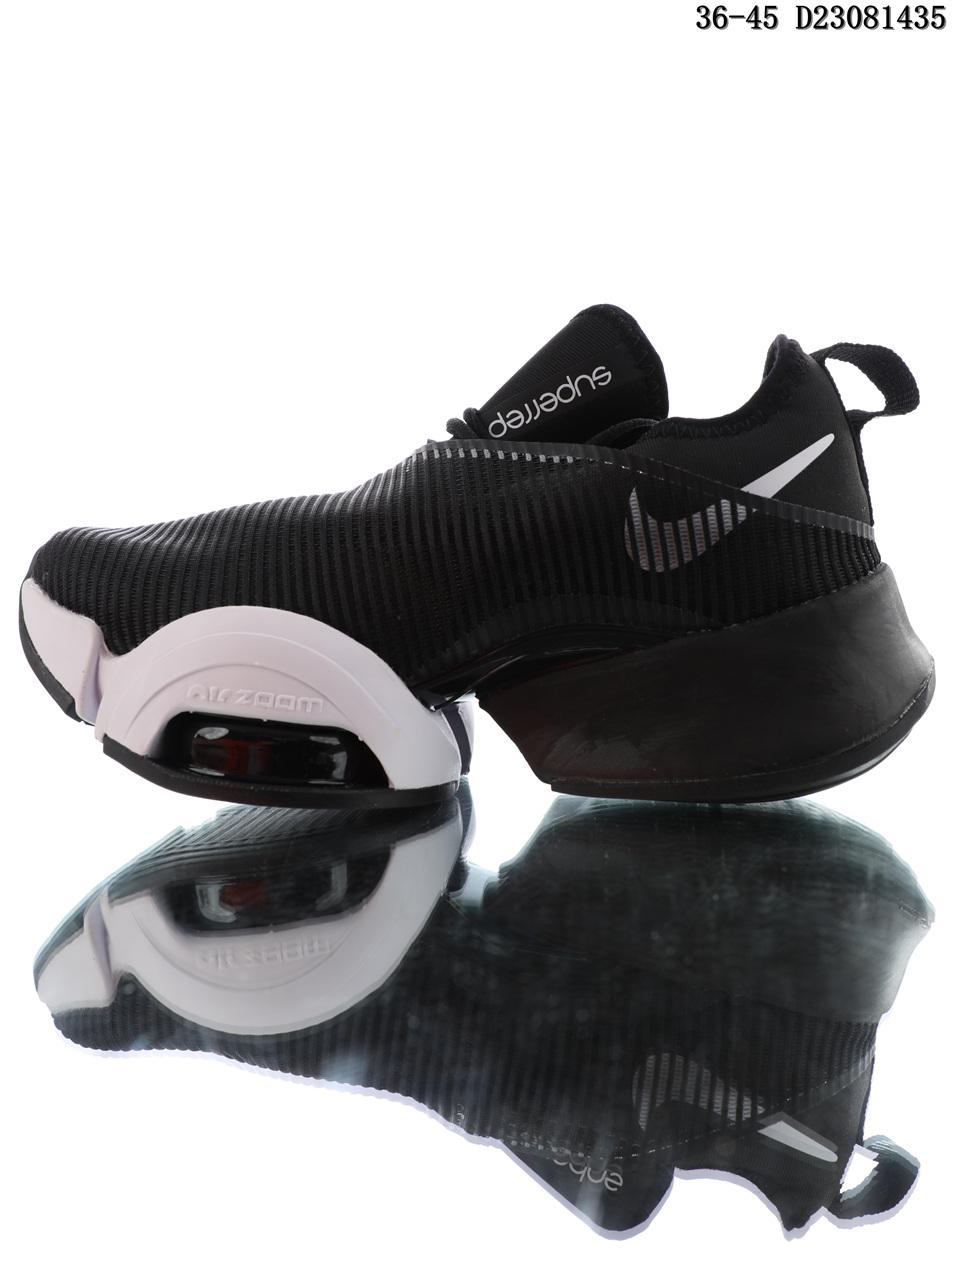 Nike Air Zoom Superrep black and white air cushion running shoes